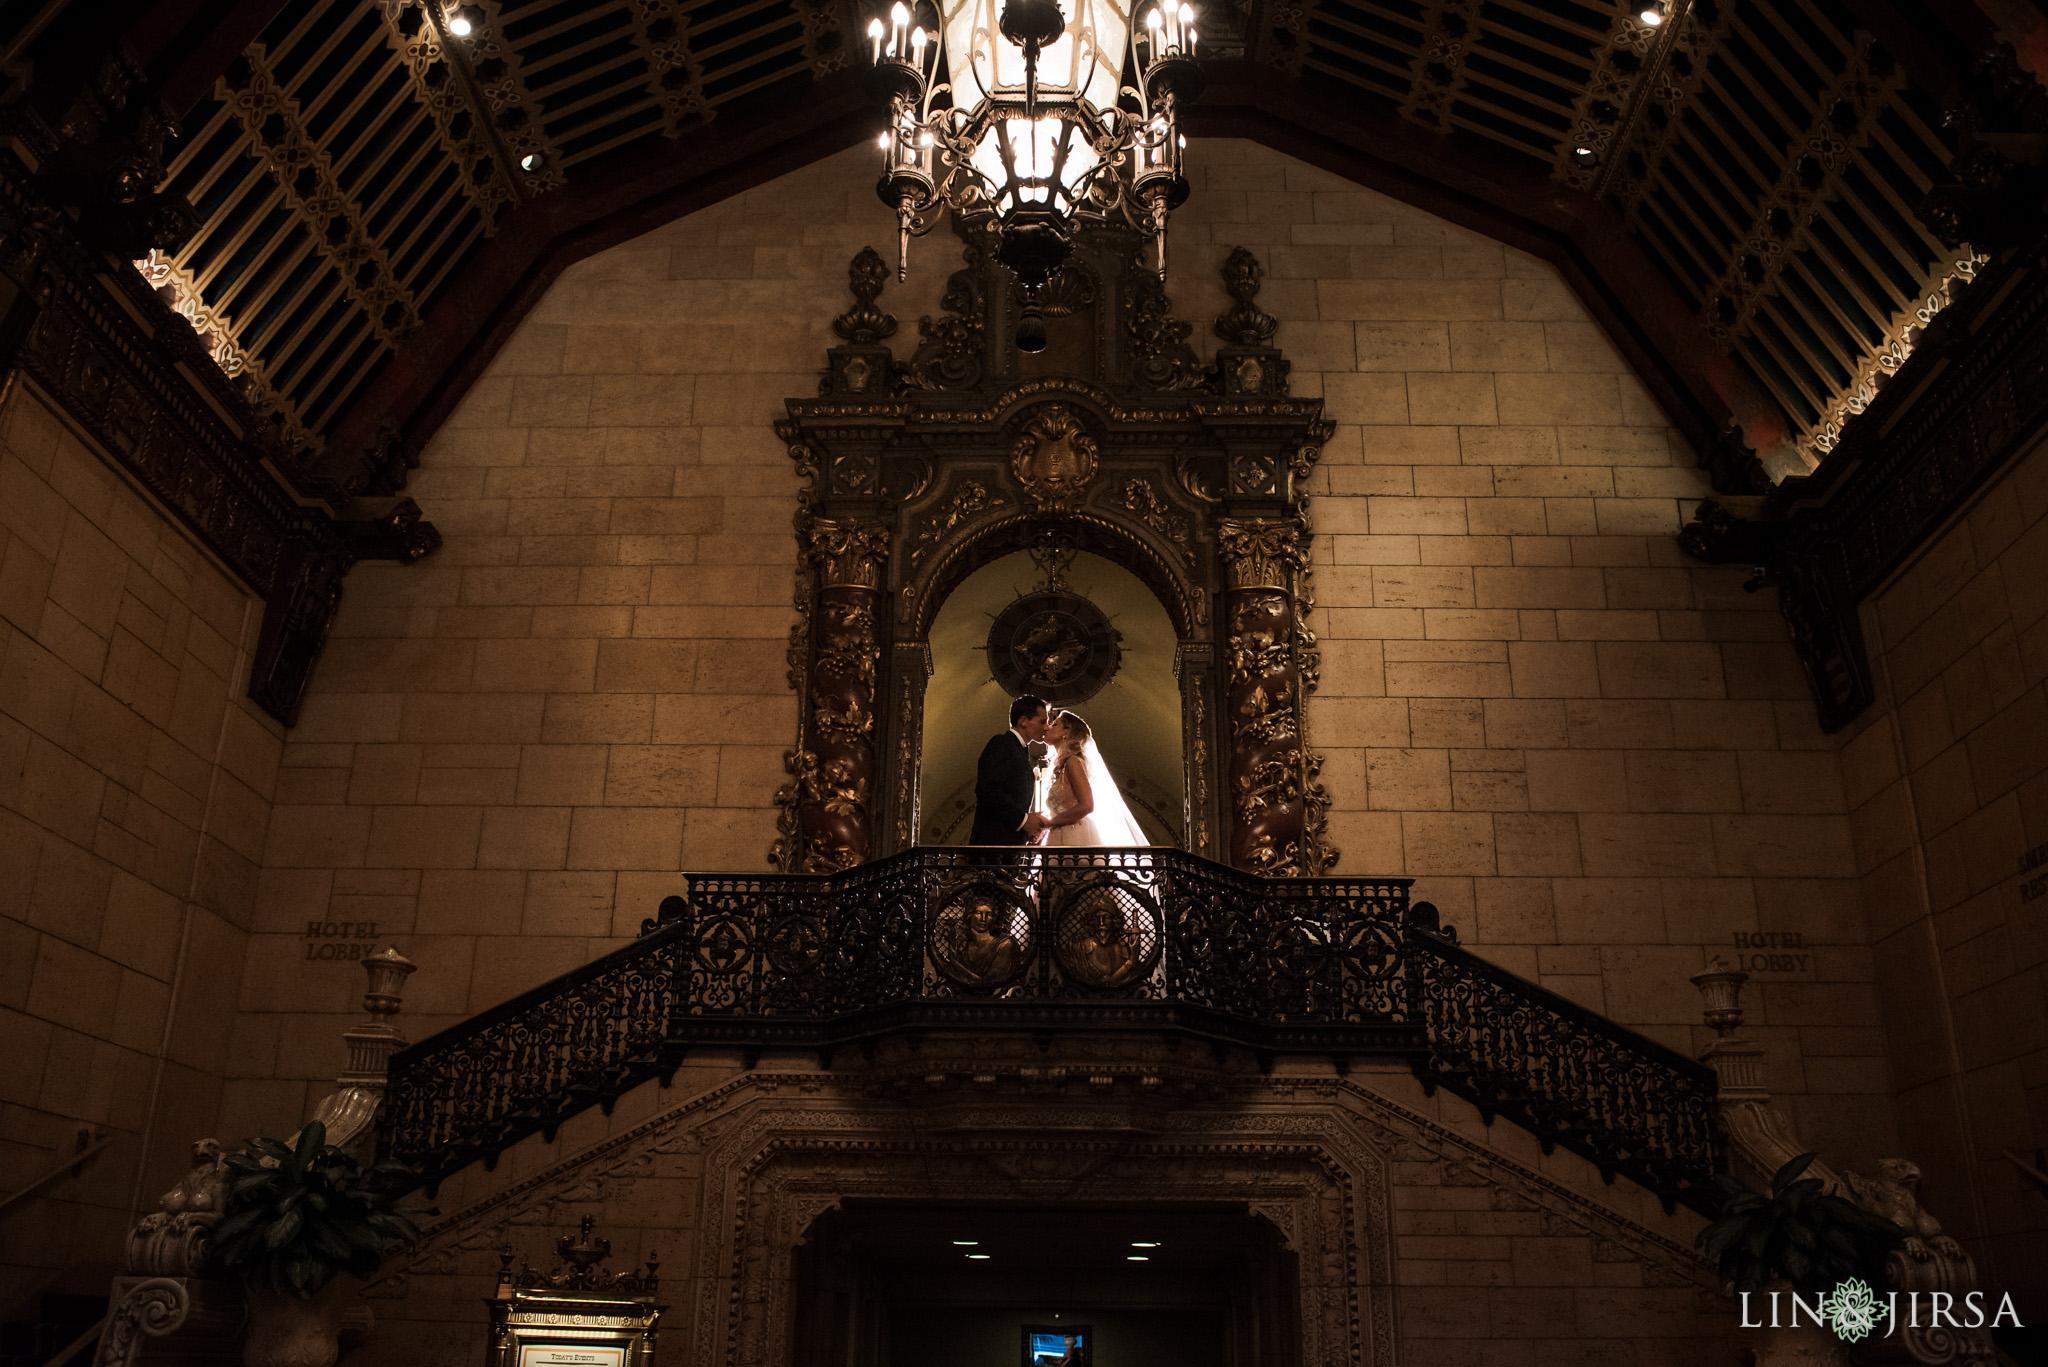 016 millennium biltmore hotel los angeles wedding photography